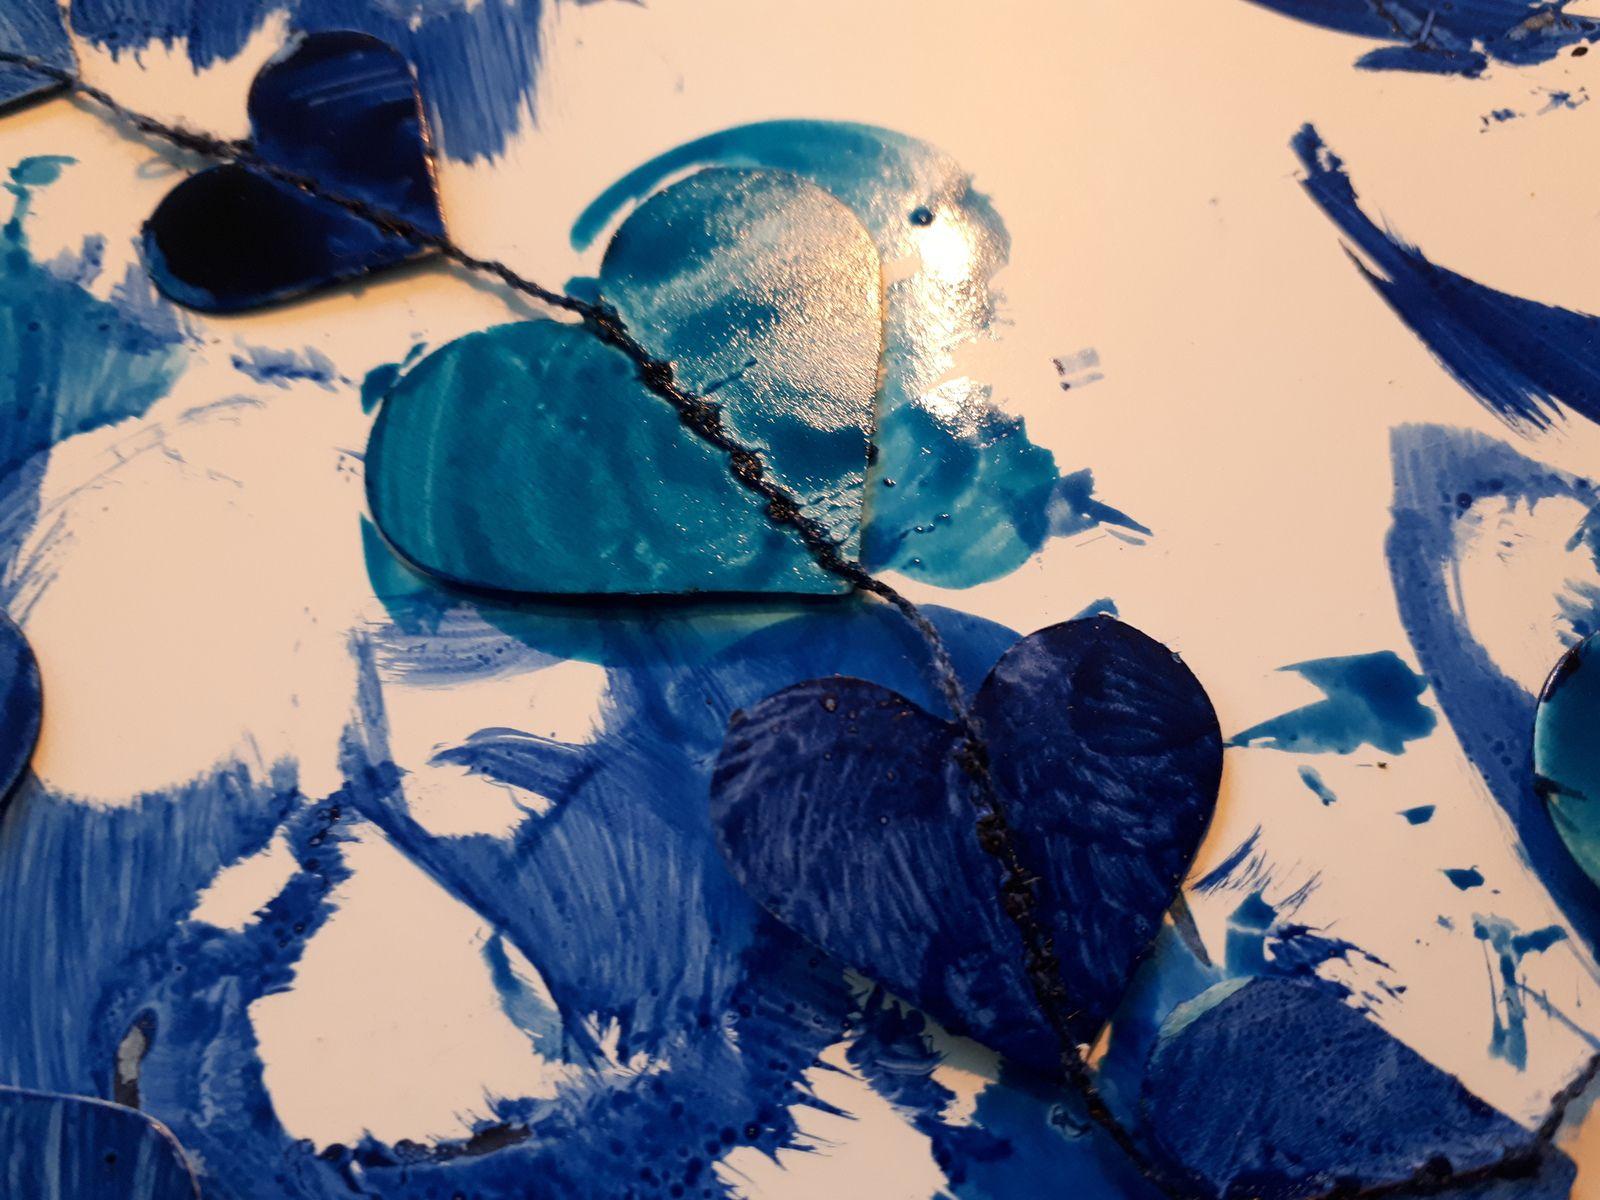 Toujours du bleu